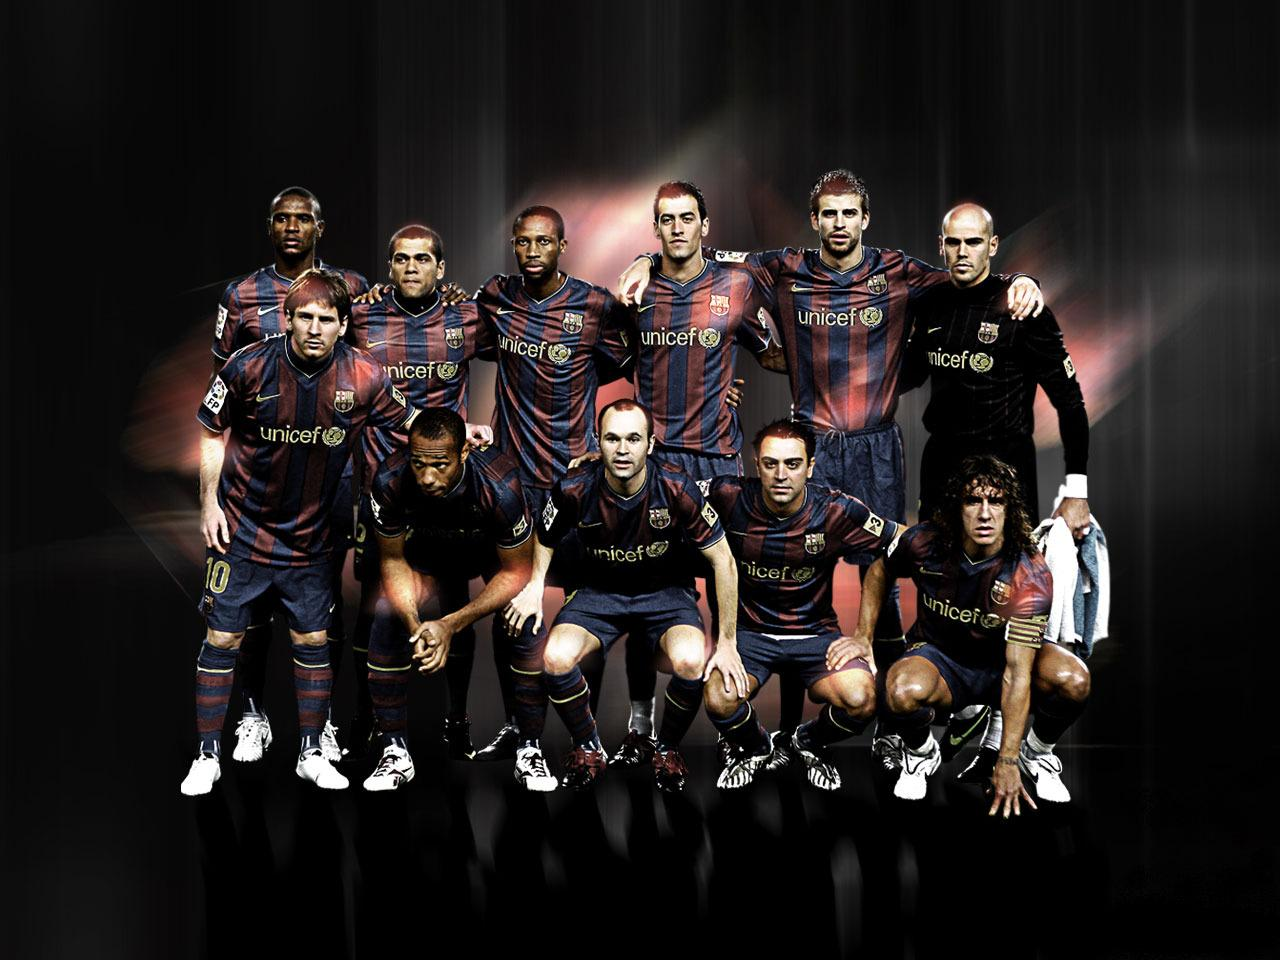 http://2.bp.blogspot.com/-bYe3nOmHlxc/UPRJ1-SVm-I/AAAAAAAAMoc/y56O9jXv0aQ/s1600/FC-Barcelona-Cool-Wallpapers+01.jpg